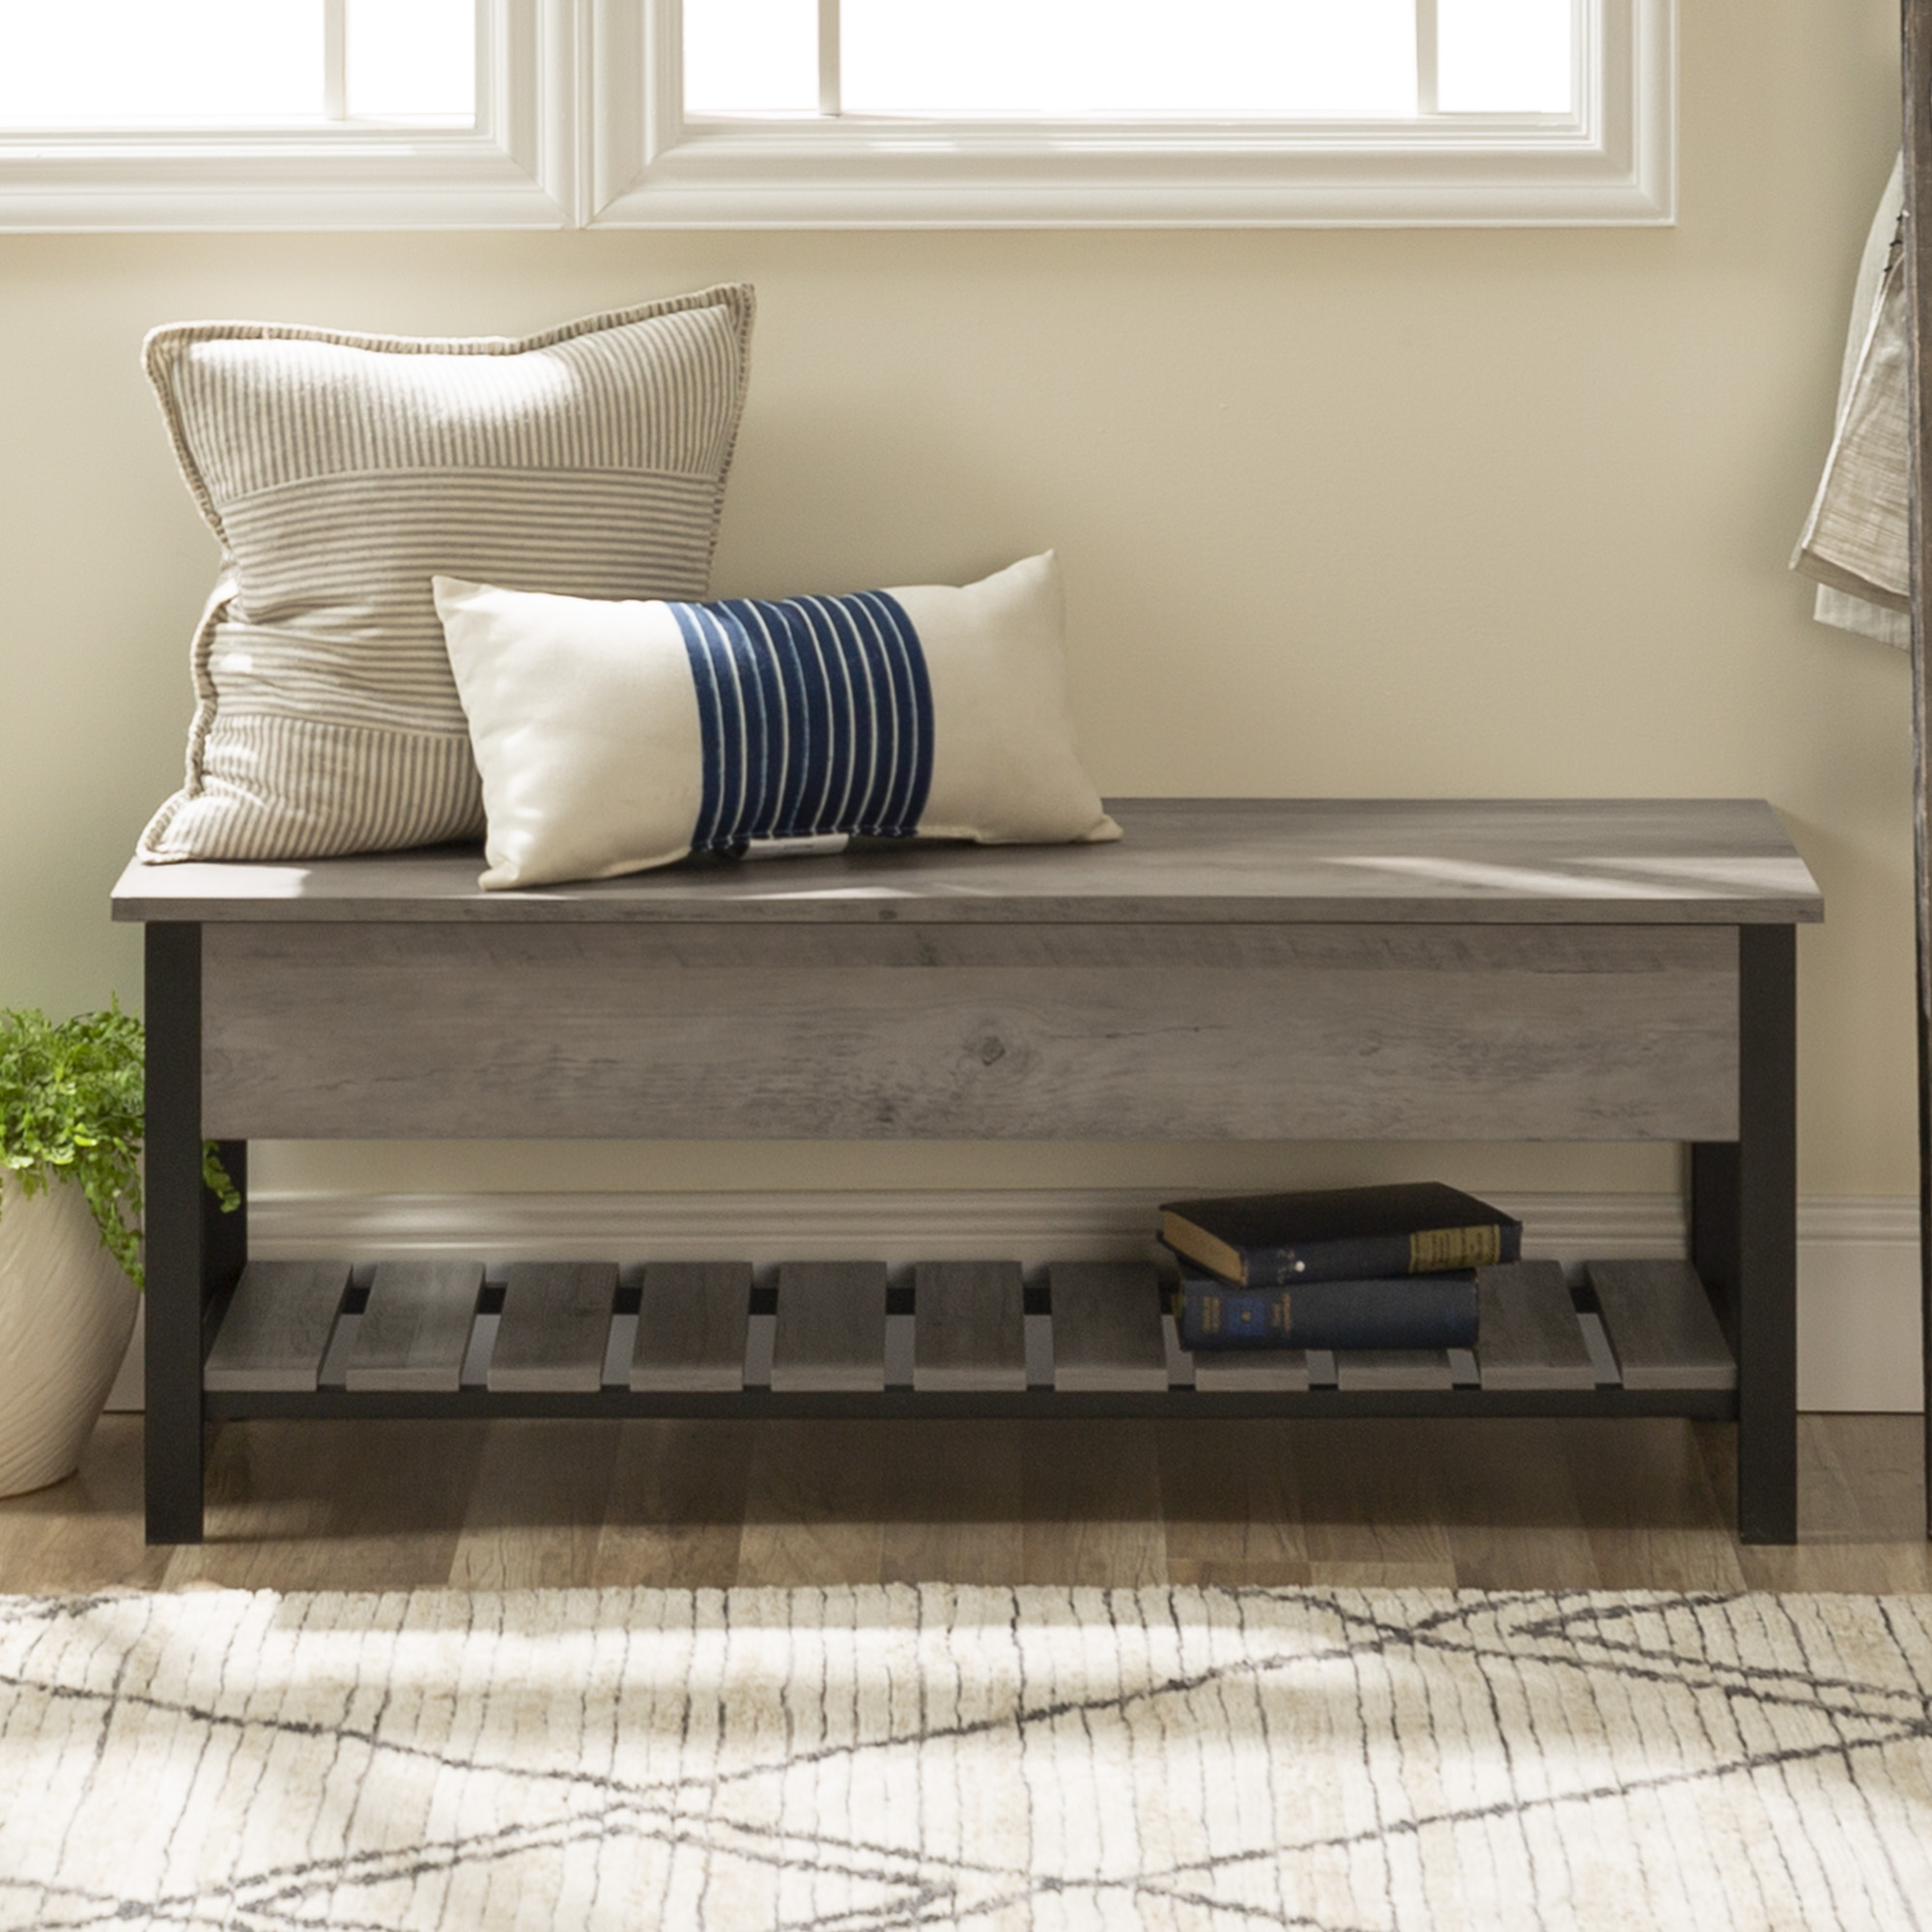 "48"" Rustic Modern Farmhouse Storage Bench with Shoe Shelf - Gray Wash"